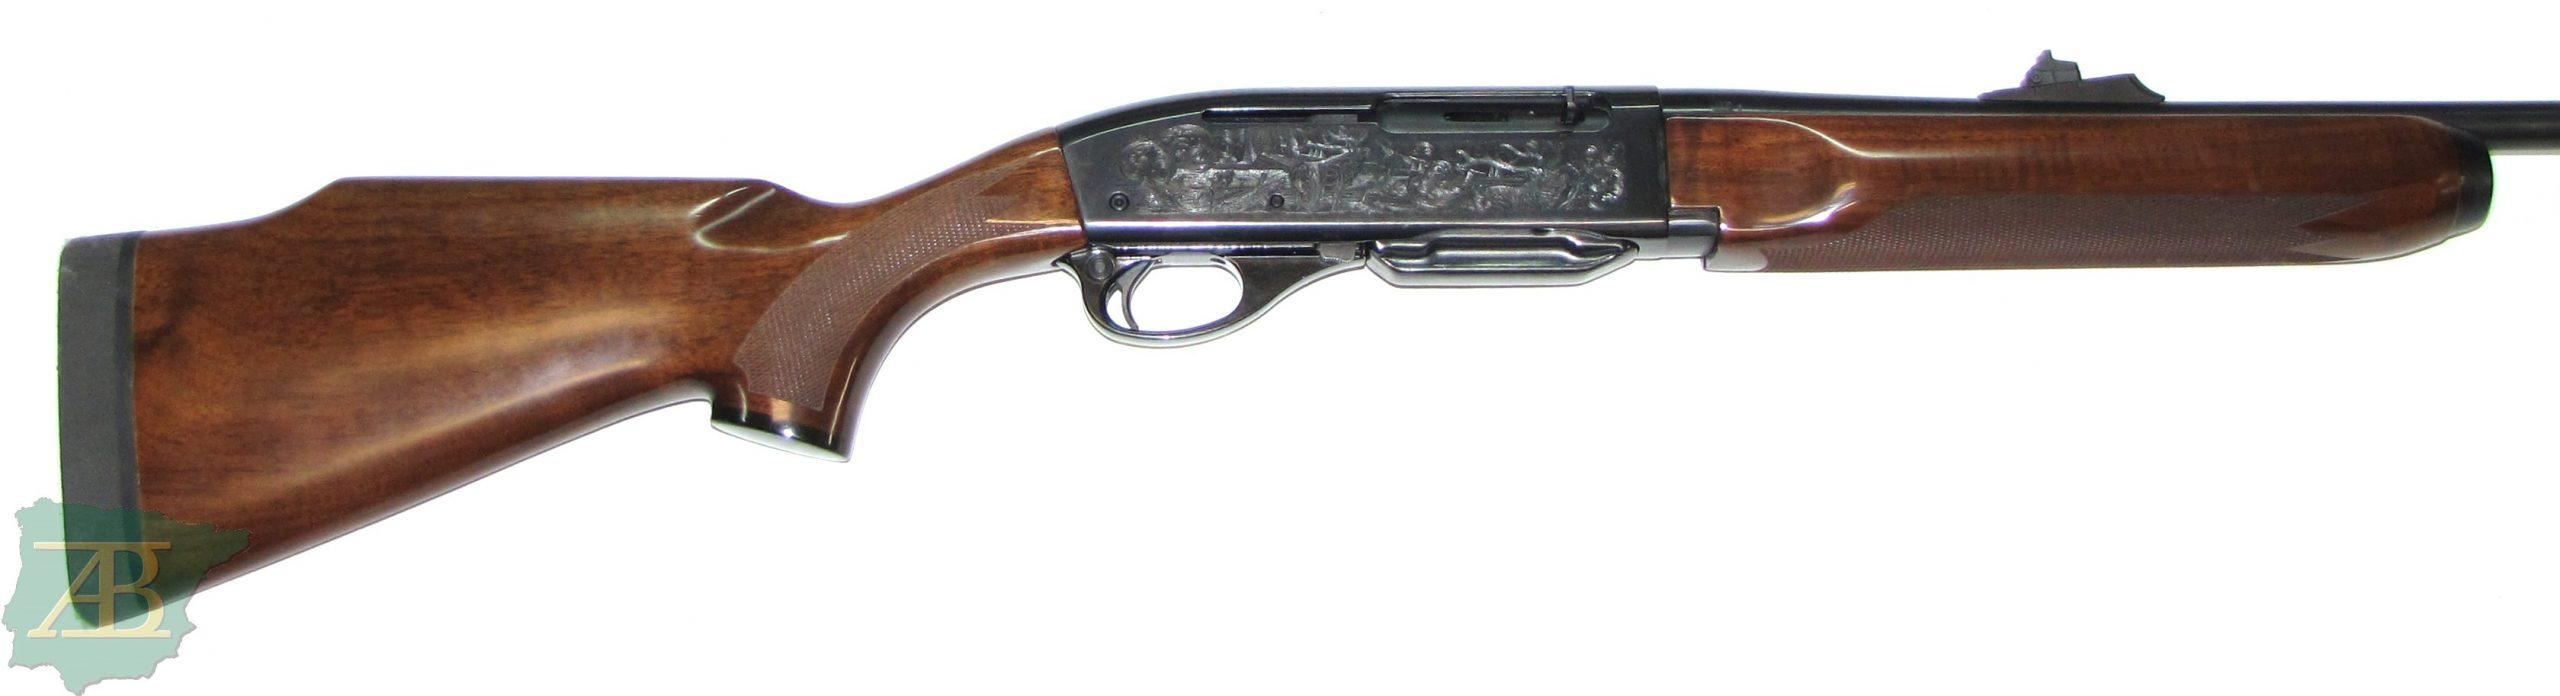 Rifle semiautomático de caza REMINGTON 7400 Ref 5600-armeriaiberica-2